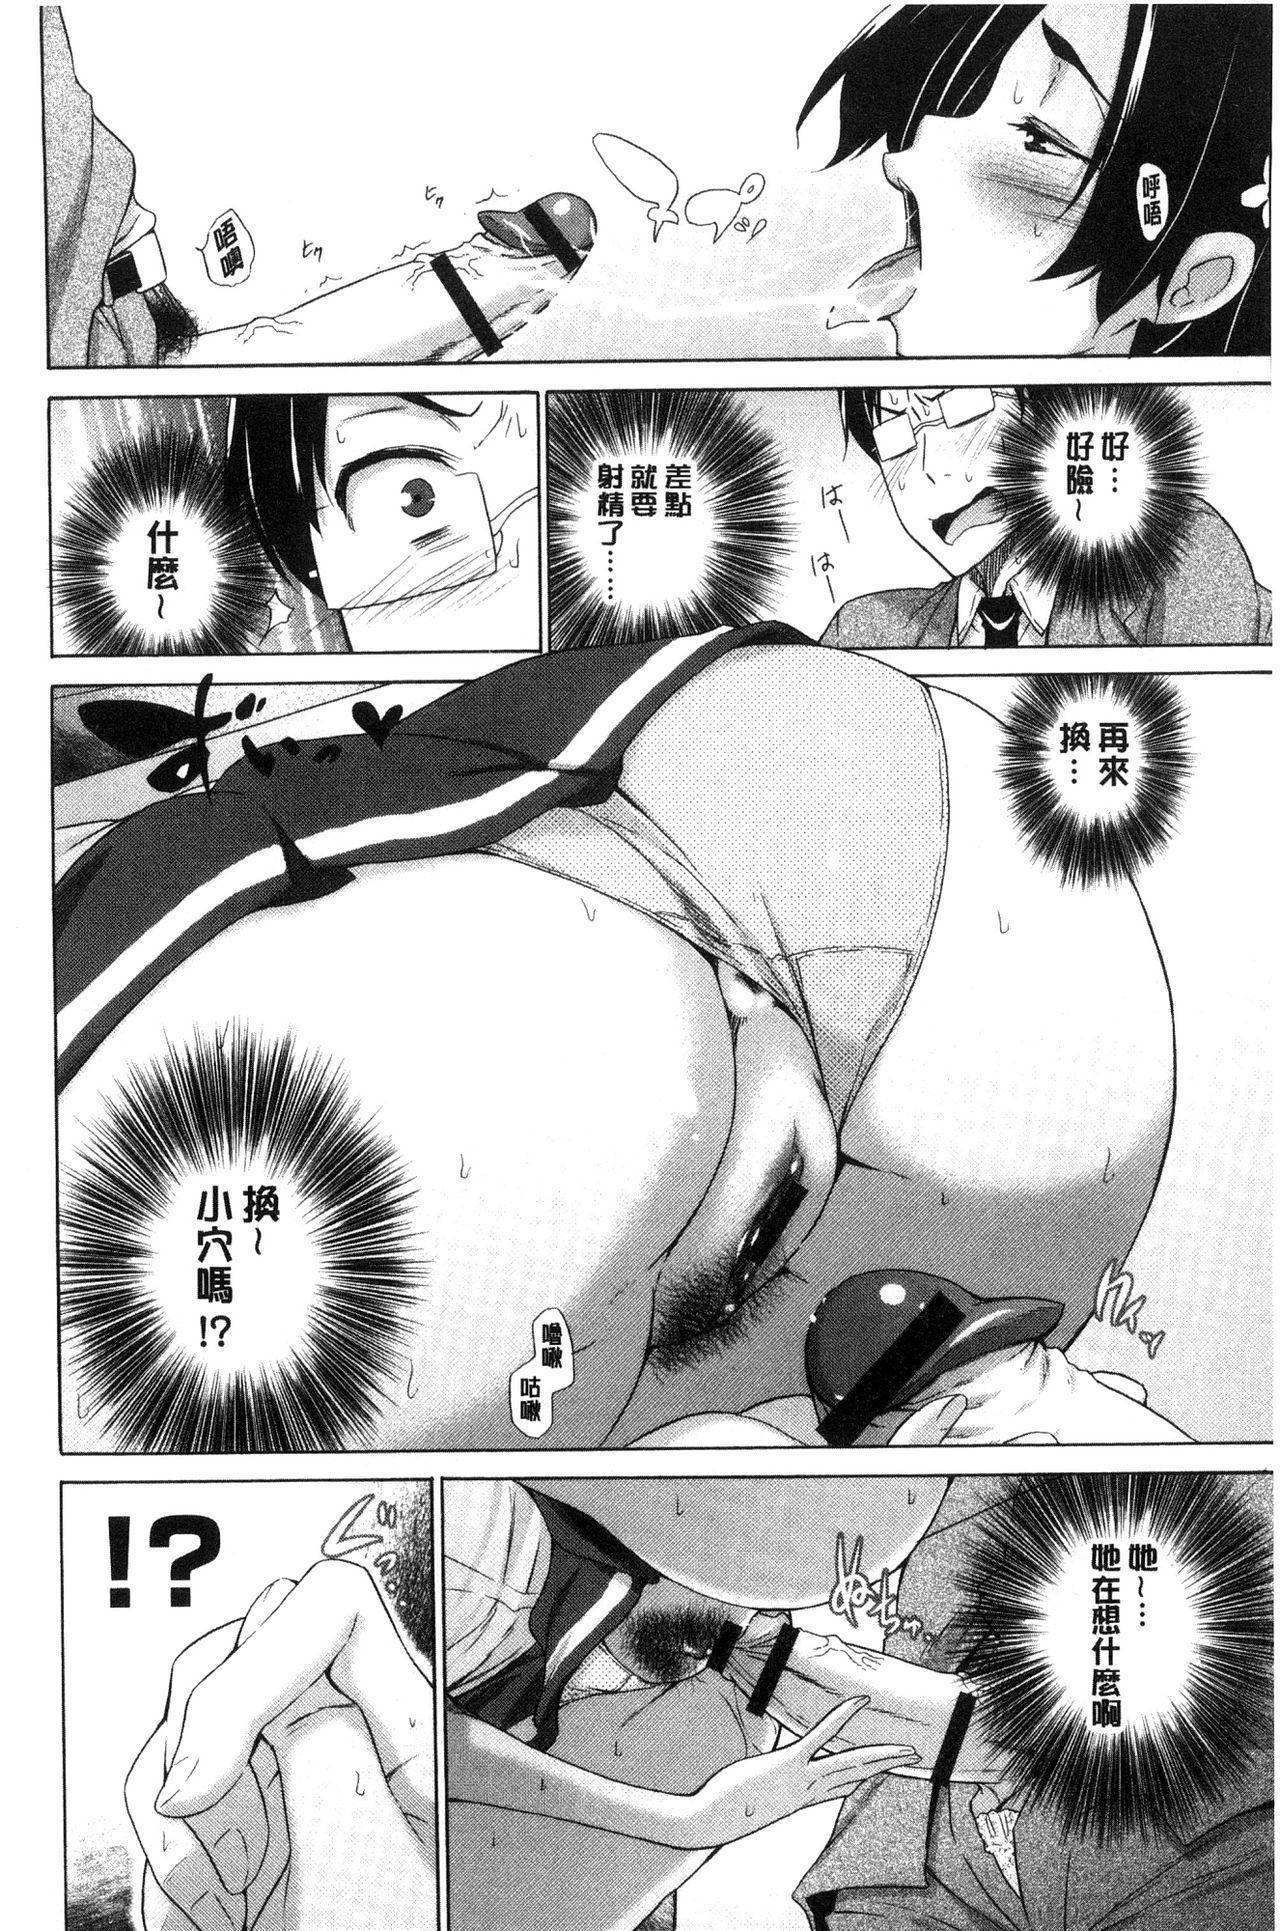 [Miyano Kintarou] Hishoujo List - The Non-Virgin List  | 非處女的名單 [Chinese] 119